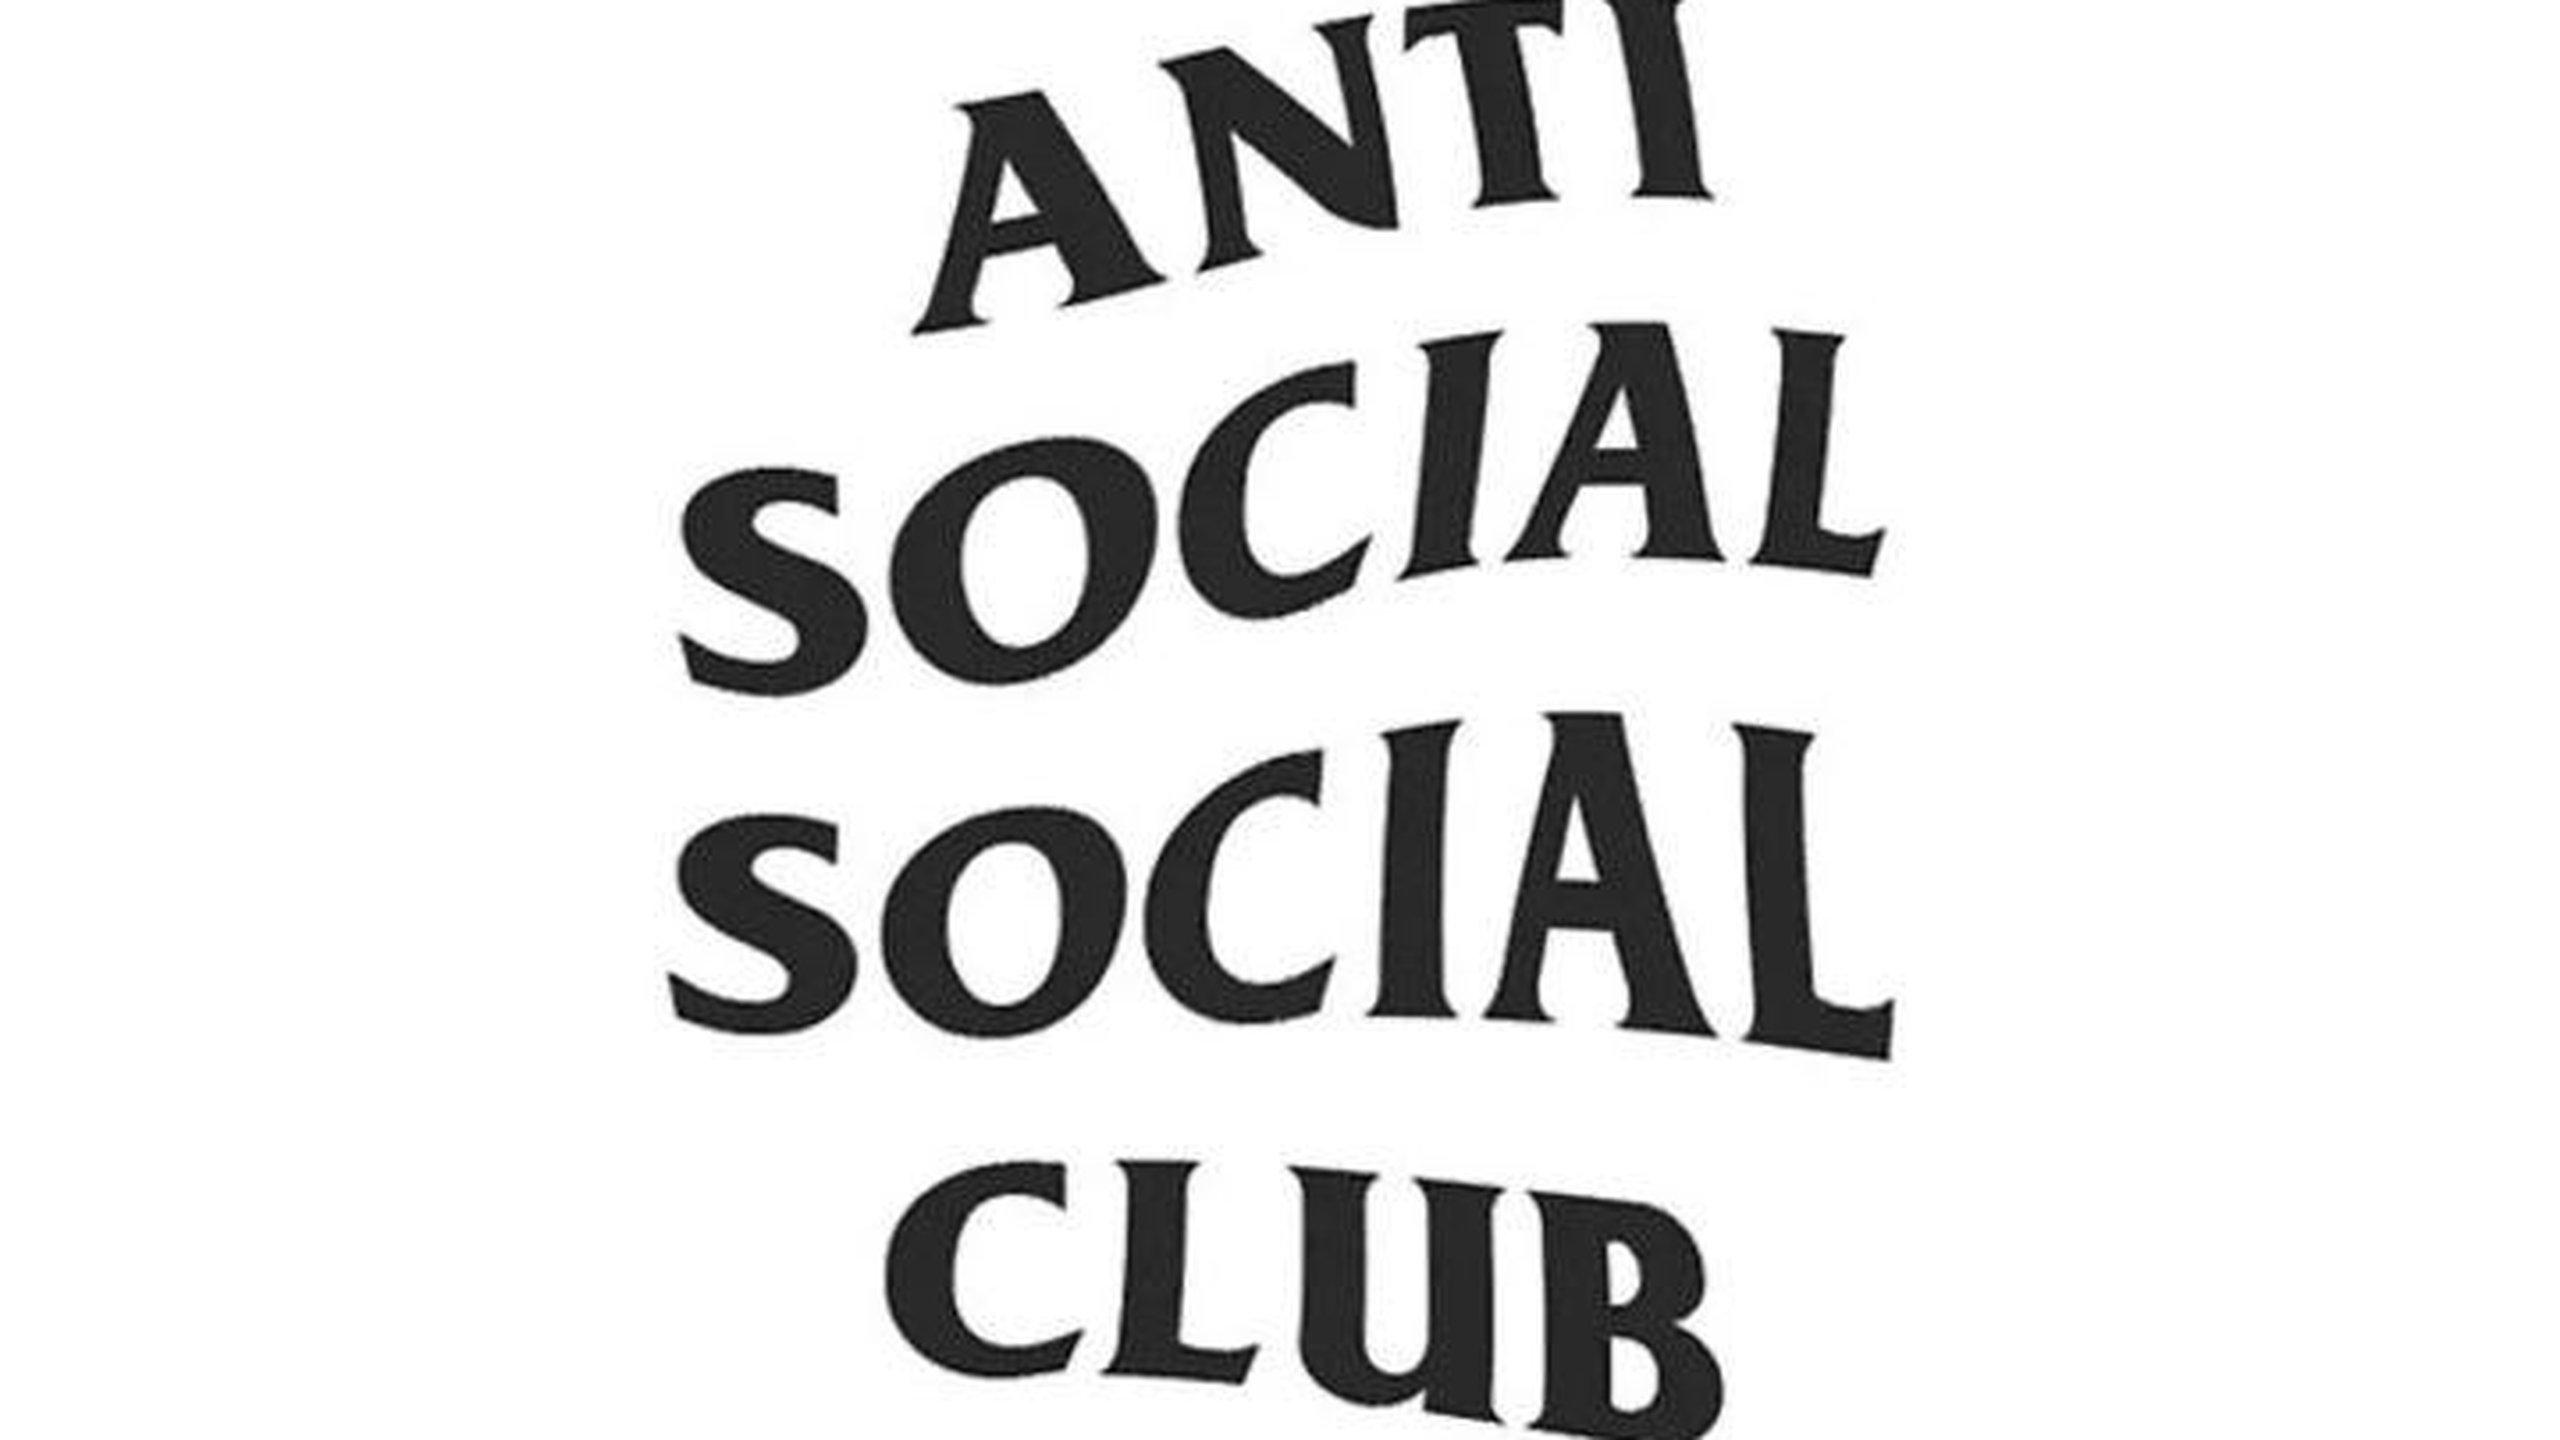 Download Black and White Anti Social Social Club Logo Hypebeast 2560x1440